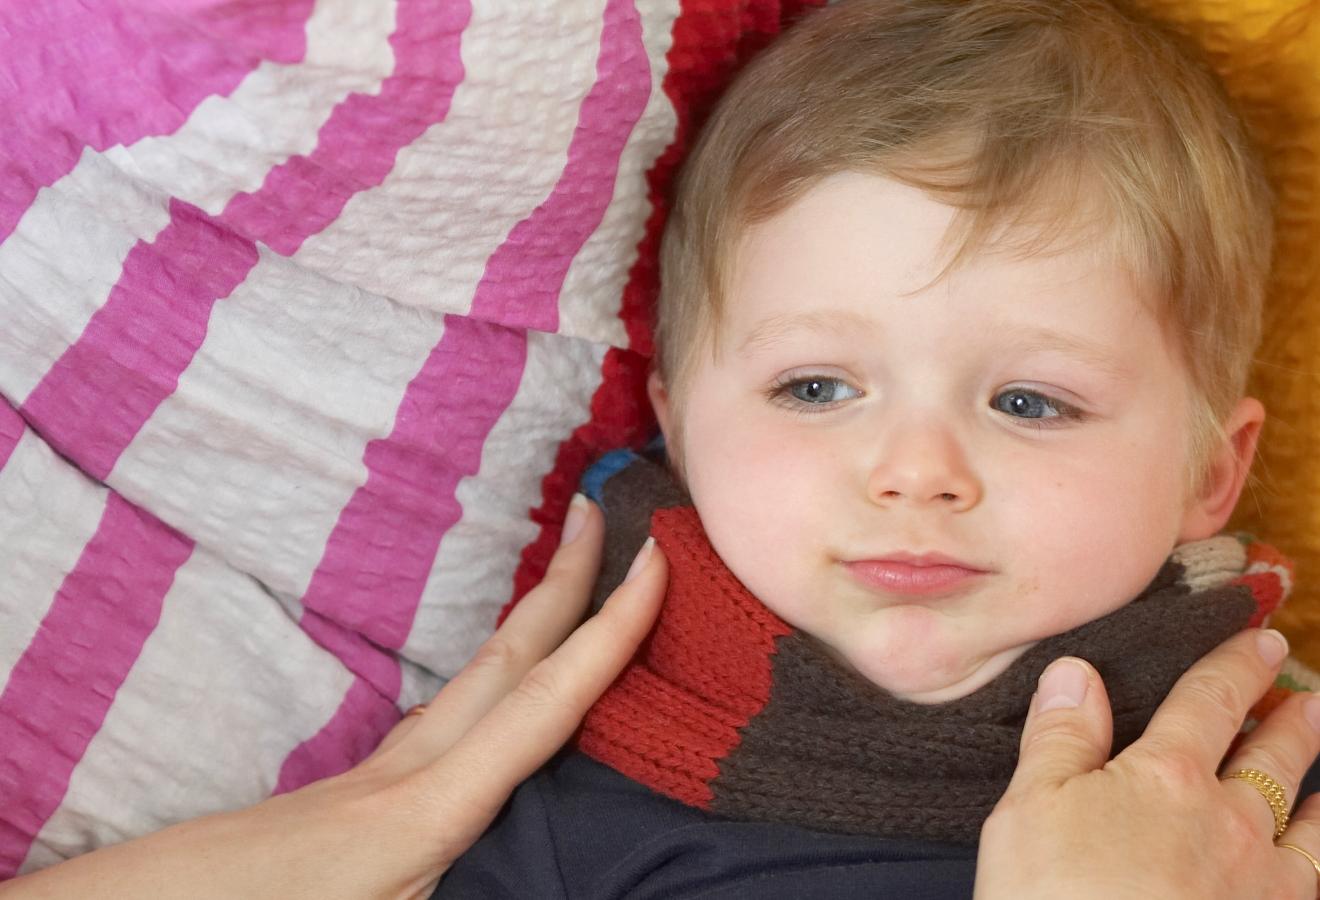 Fieber – Hitzige Körperreaktion bei Infekten